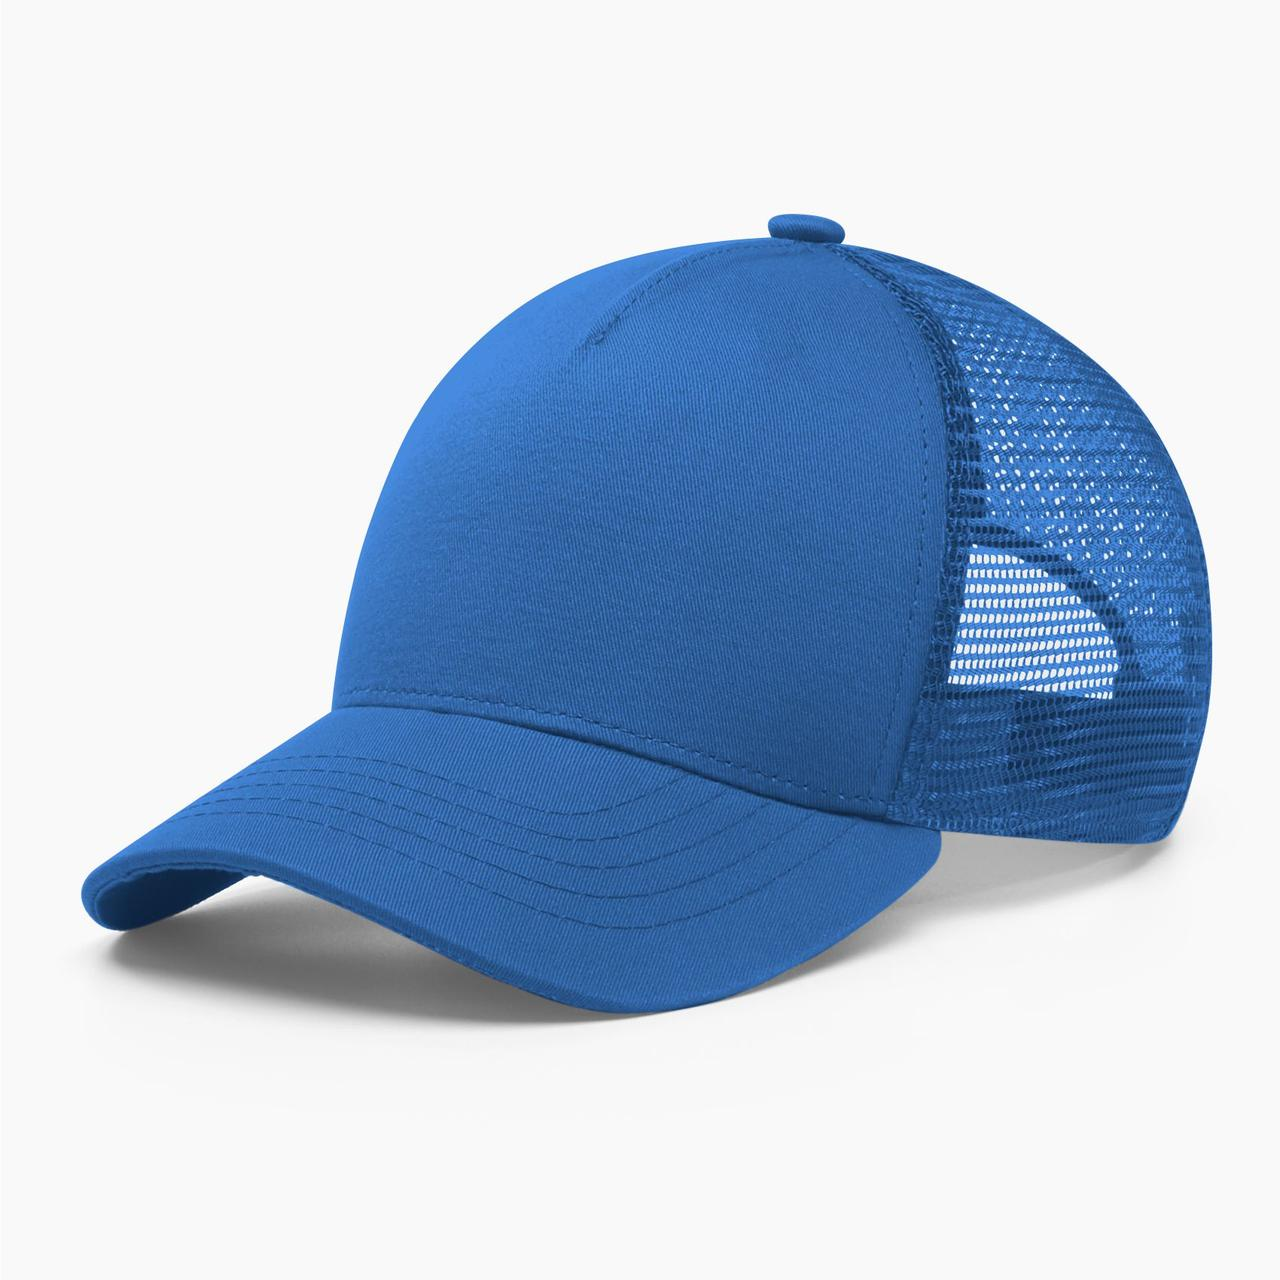 Кепка бейсболка Тракер INAL blank S / 53-54 RU Синий 204053